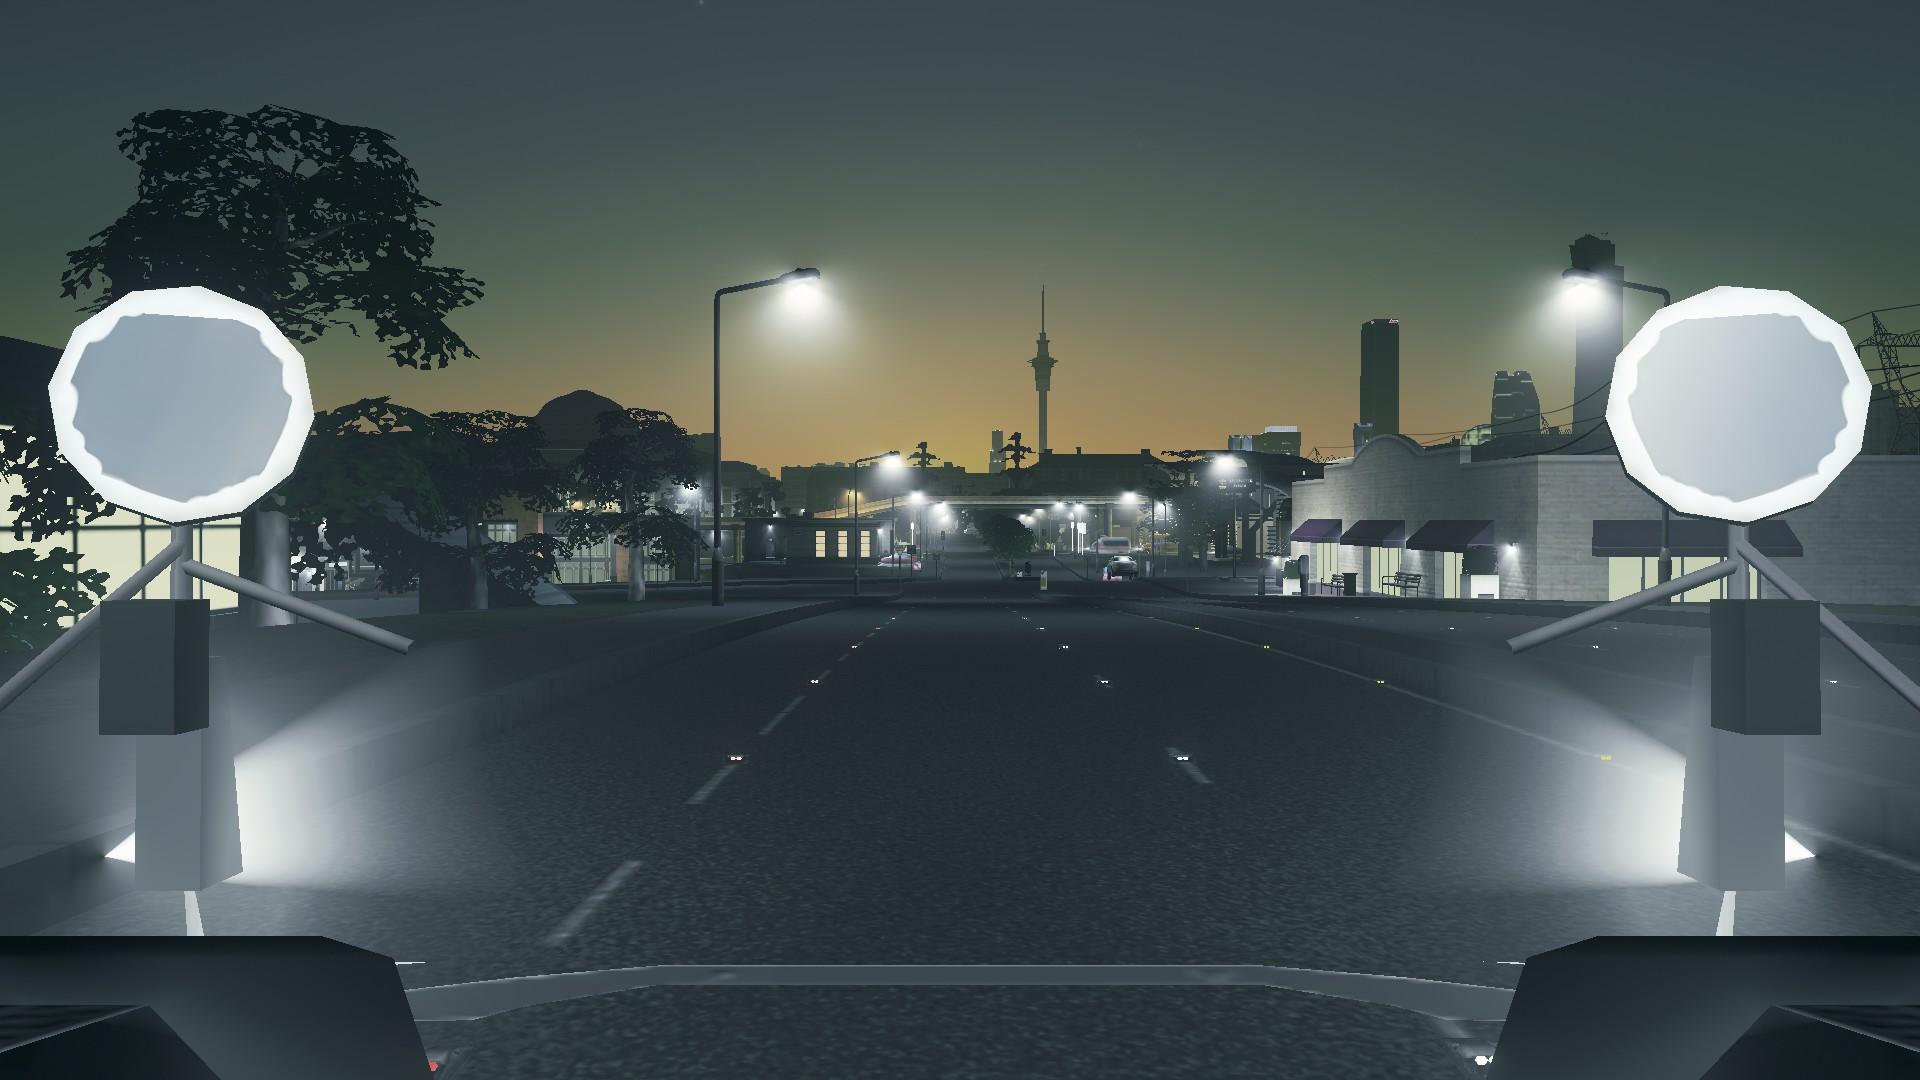 Manukau and the University of Manukau. A City Grows Up. Also Rocket Lab?